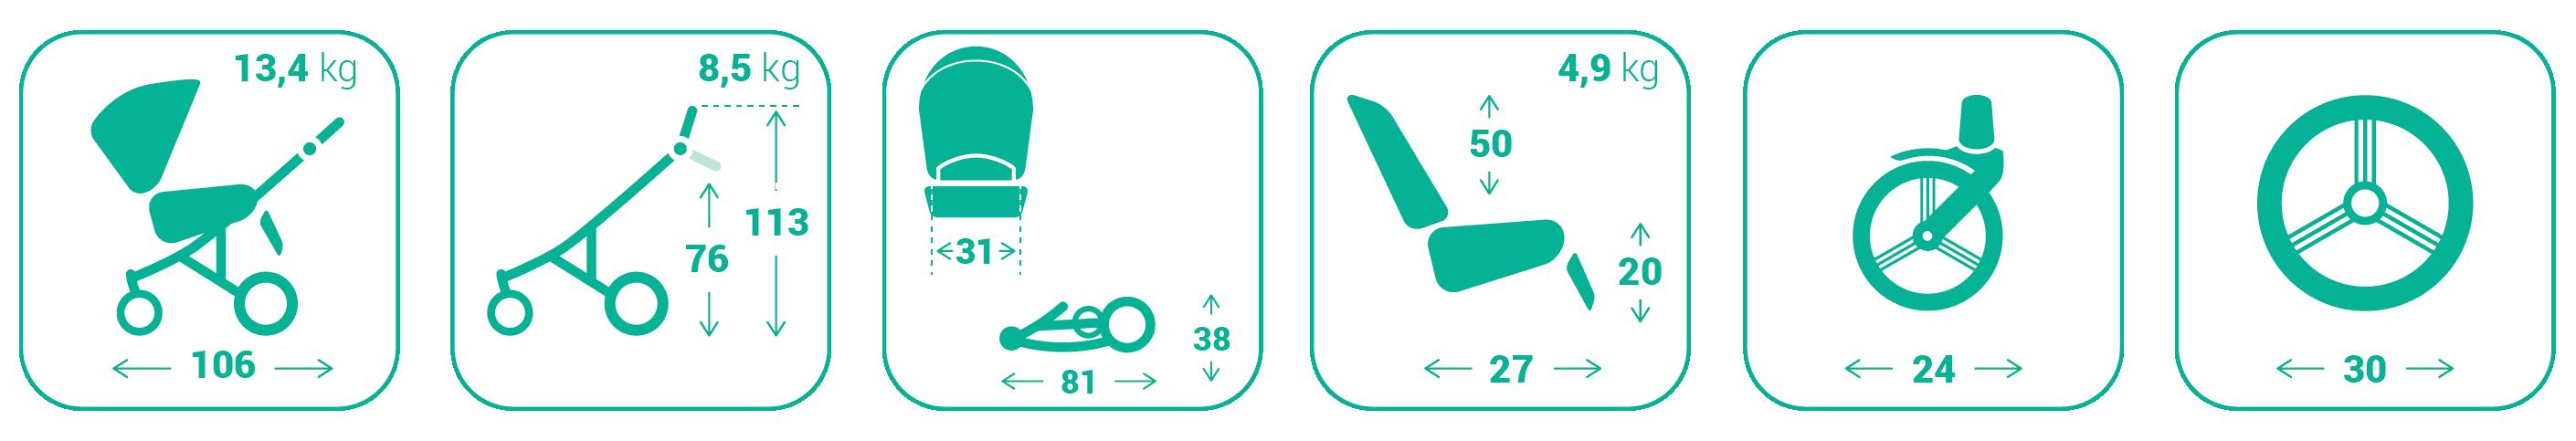 Dječja kolica Bebetto specifikacija 2019